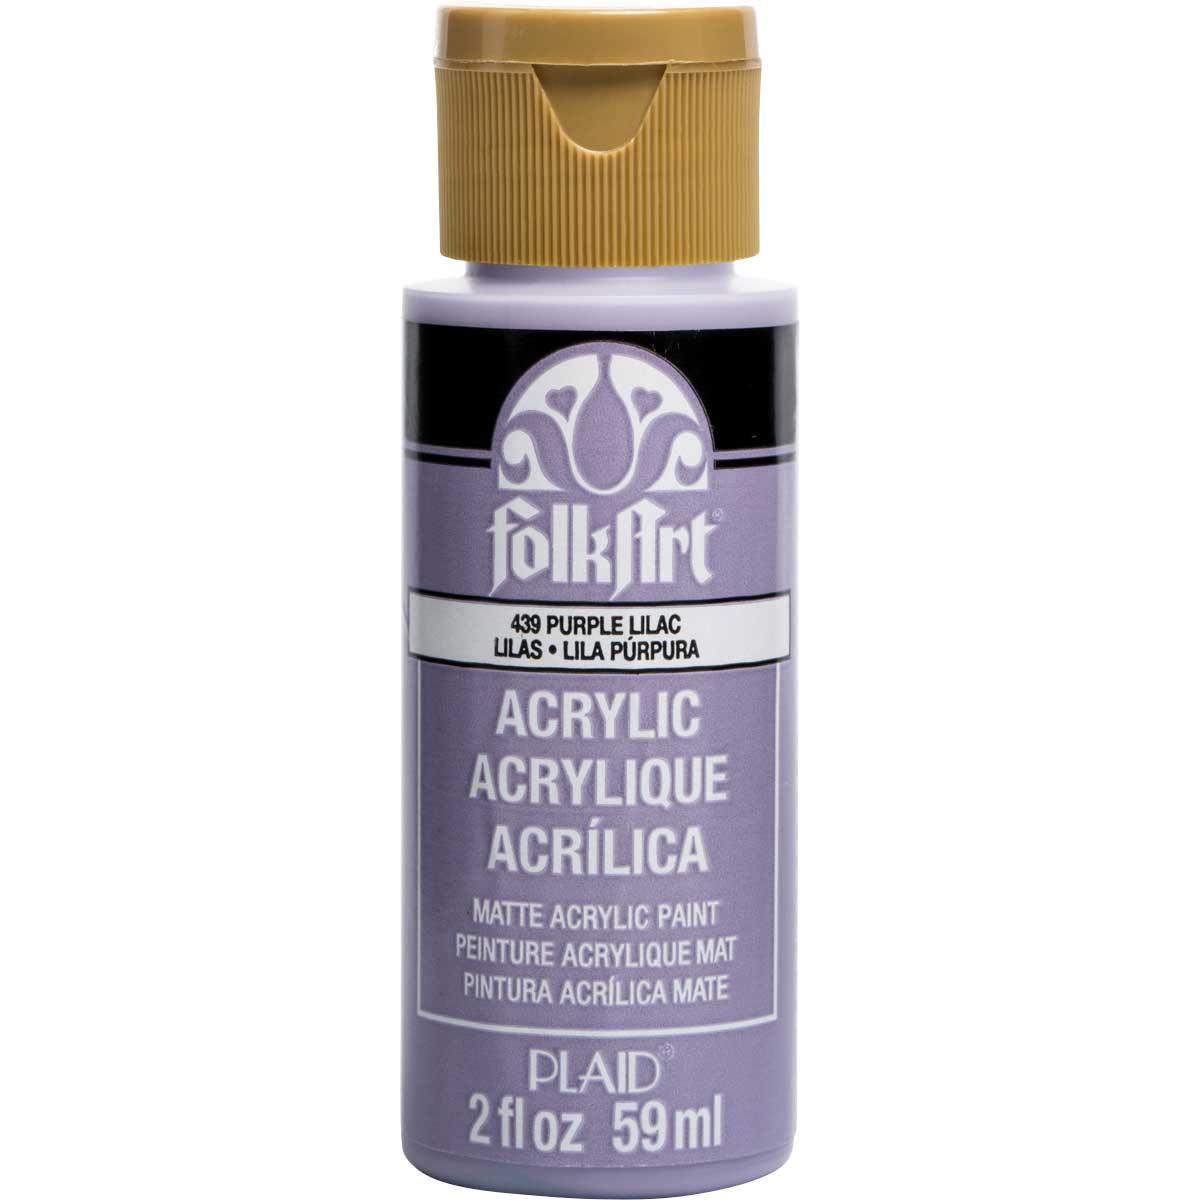 FolkArt ® Acrylic Colors - Purple Lilac, 2 oz. - 439